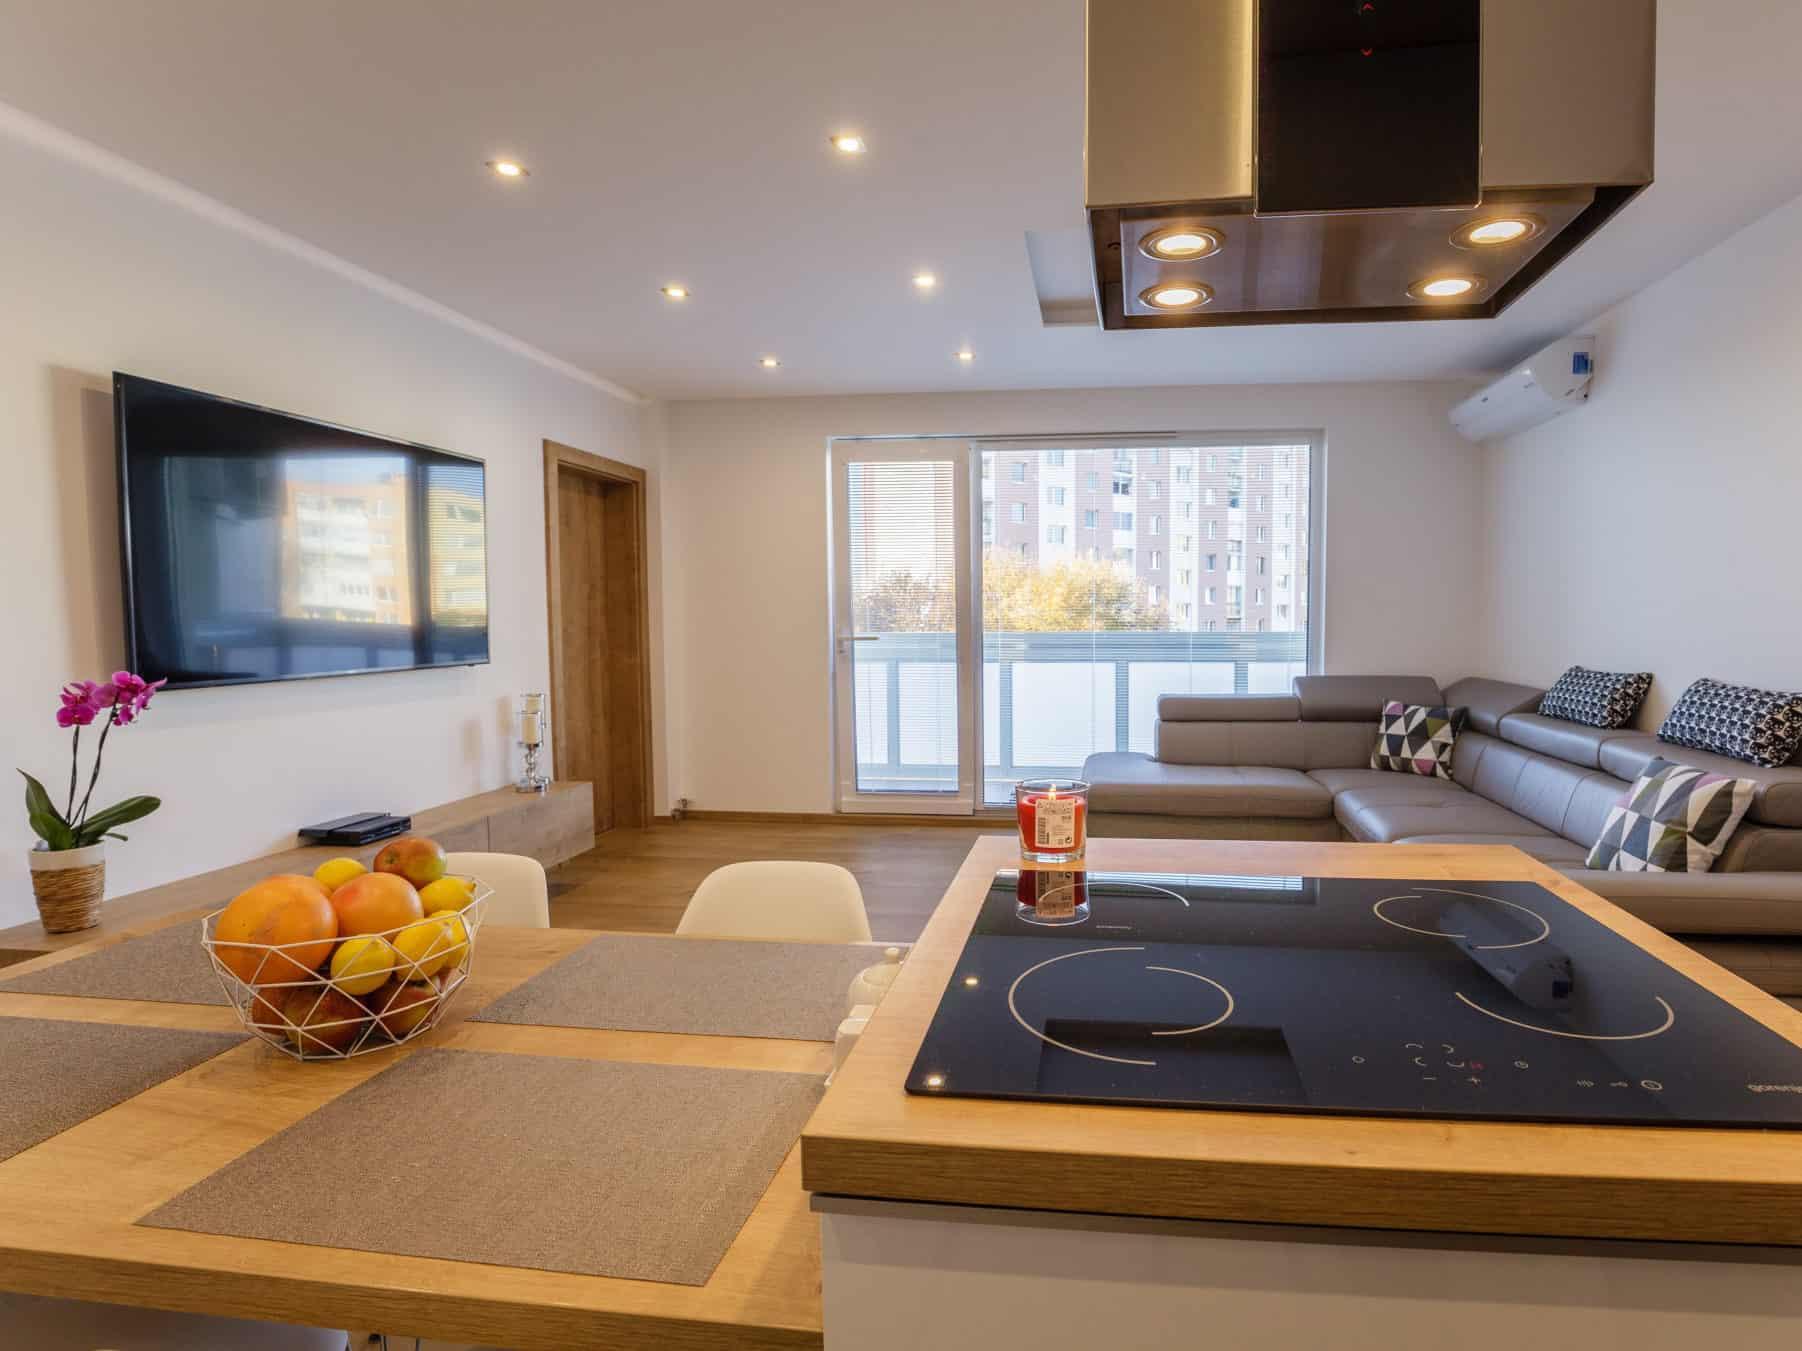 Kompletná rekonštrukcia 4 izbového bytu